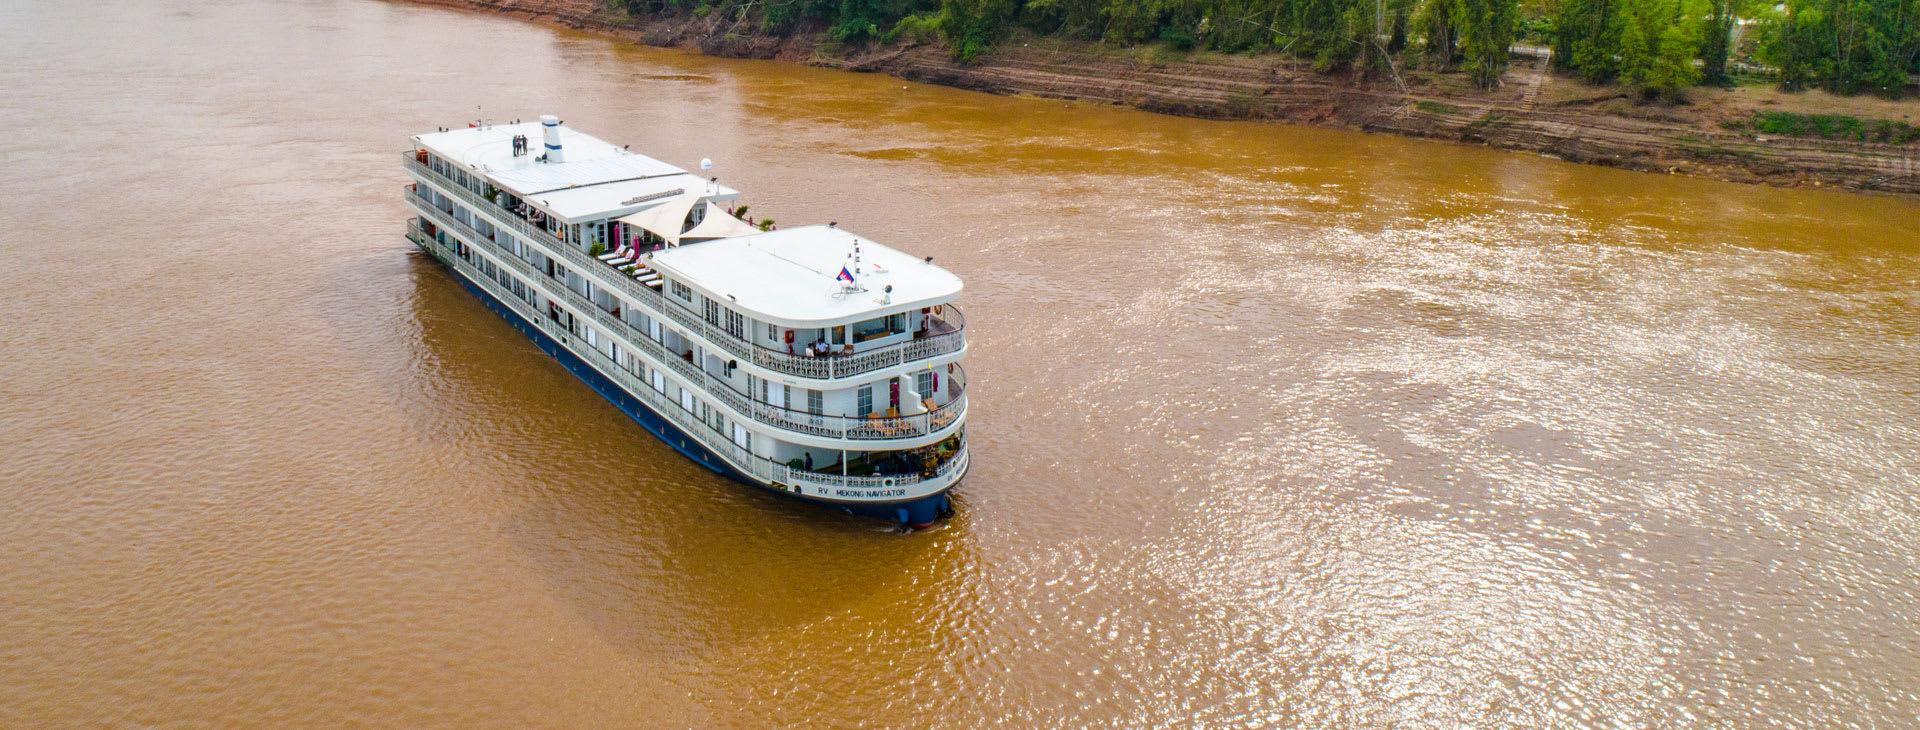 Mekong Navigator from above